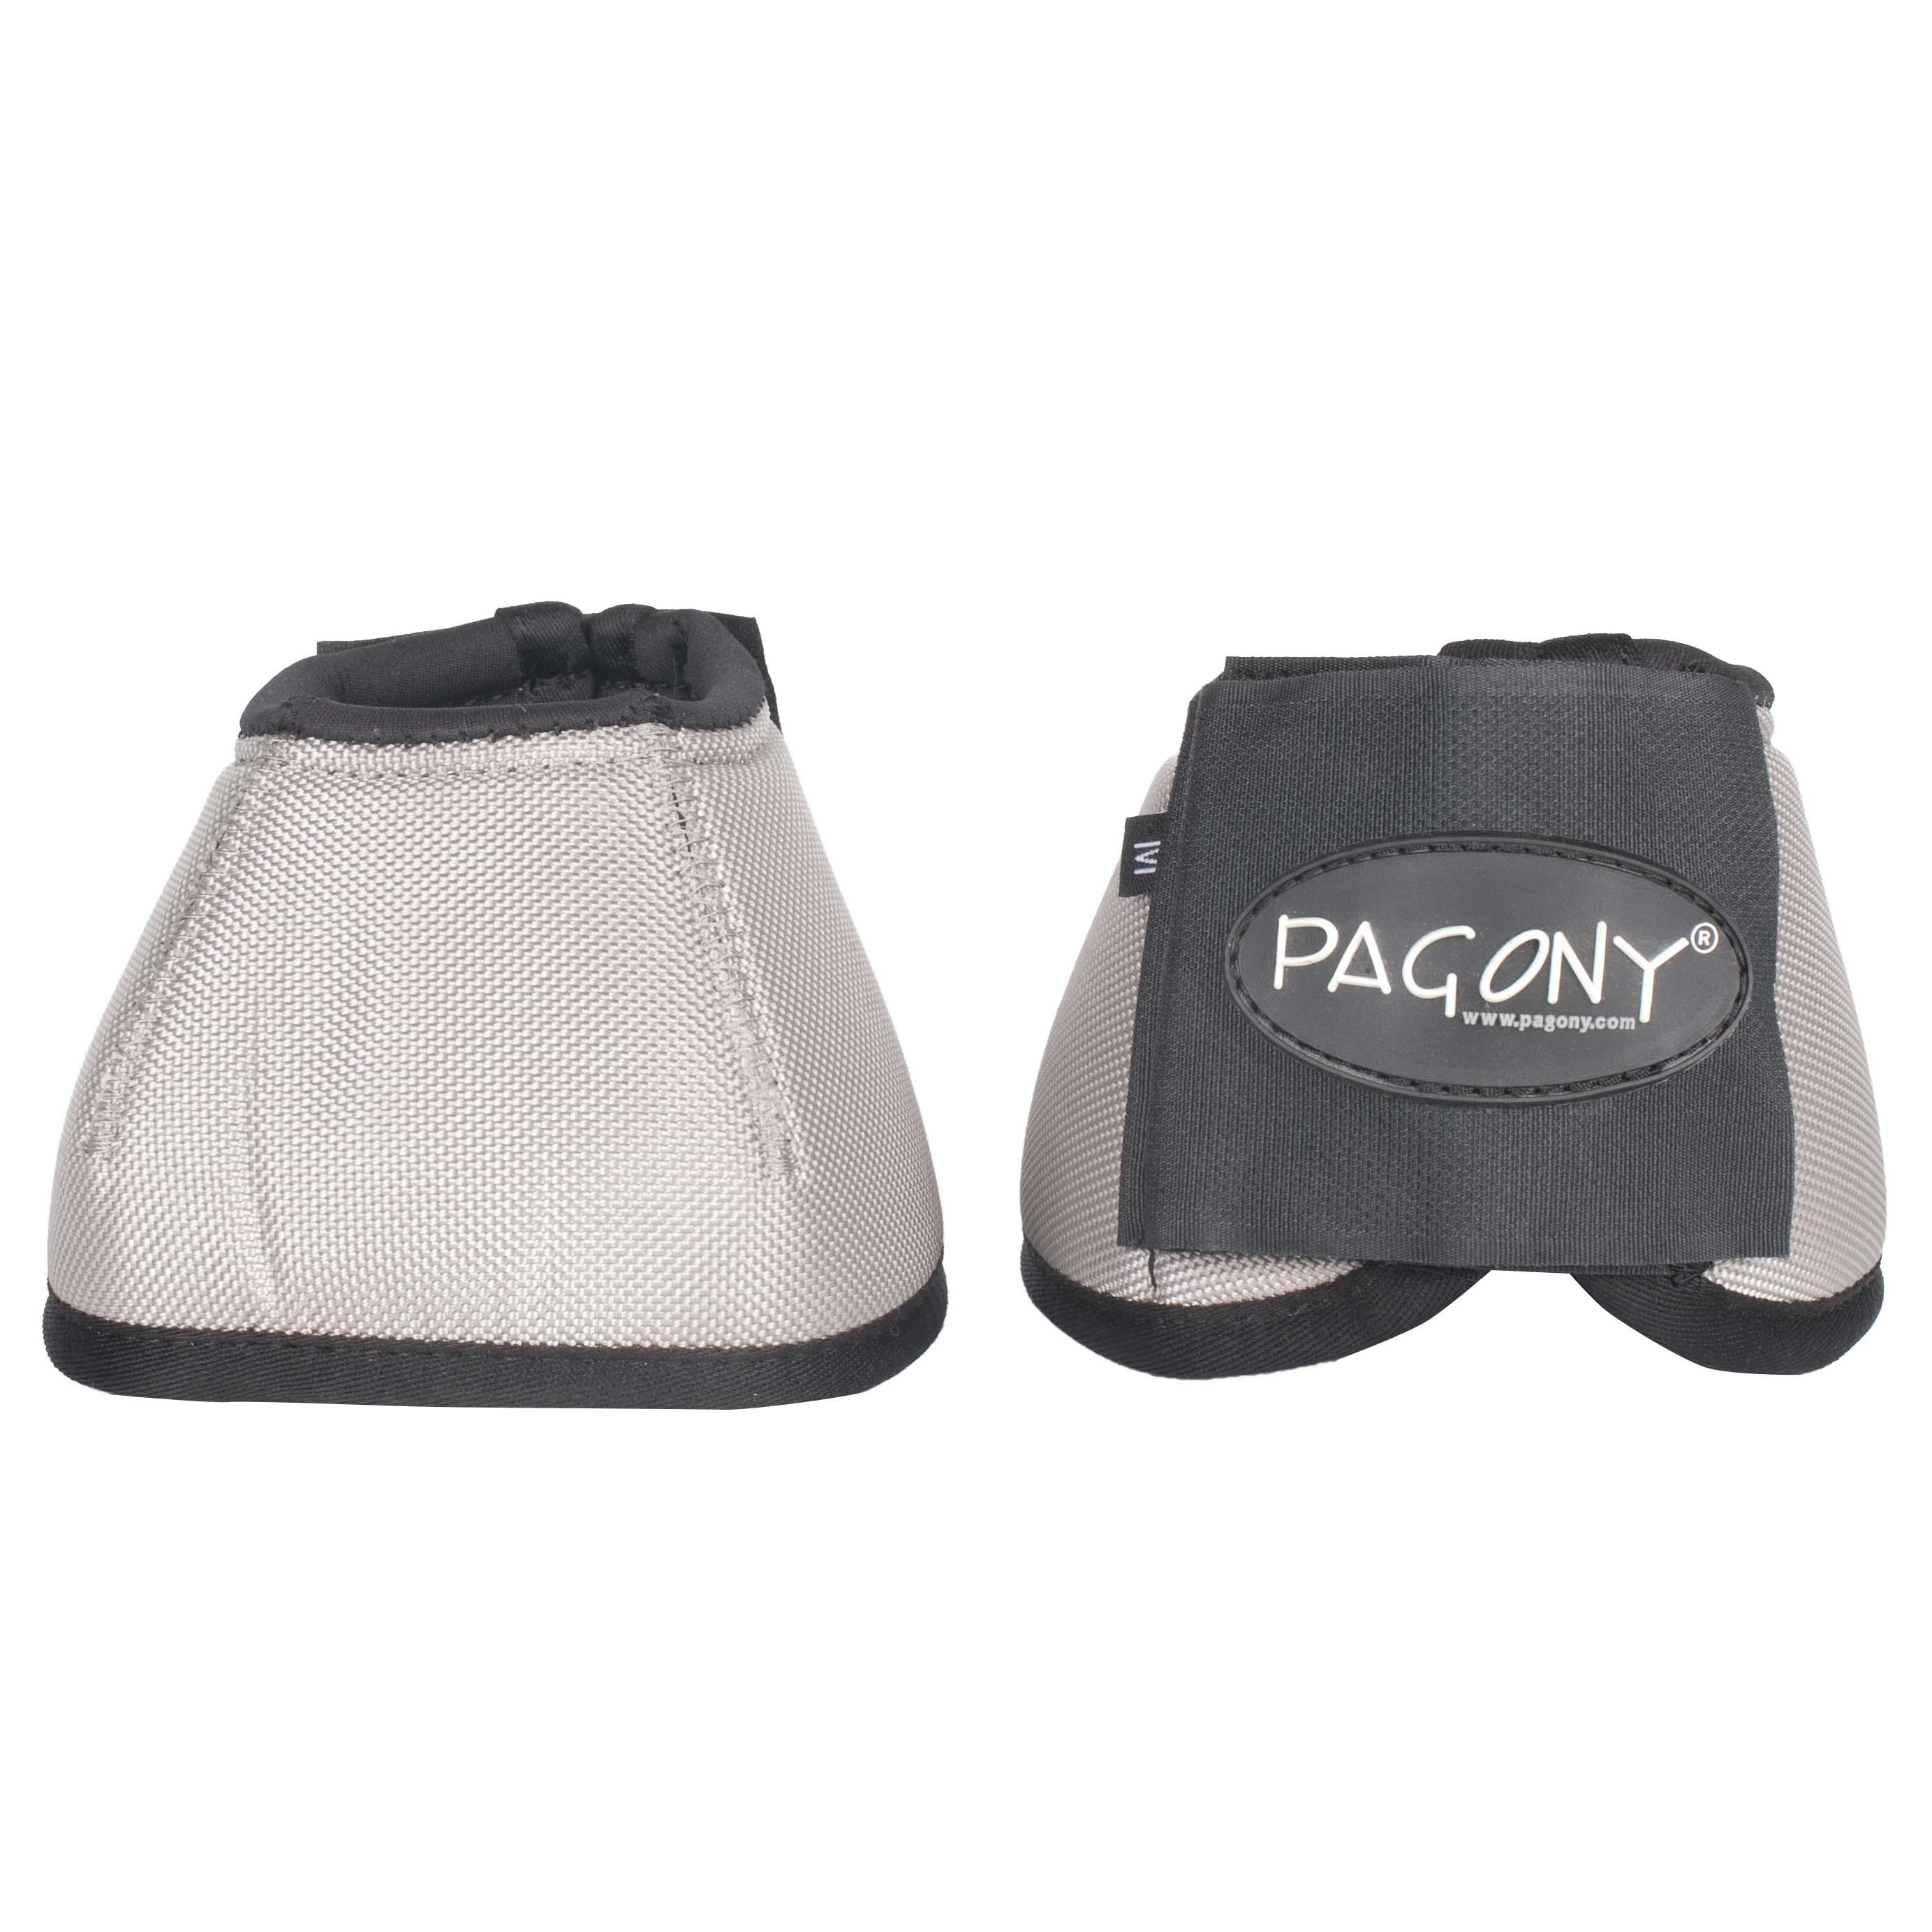 Pagony Champion springschoenen donkergrijs maat:xl